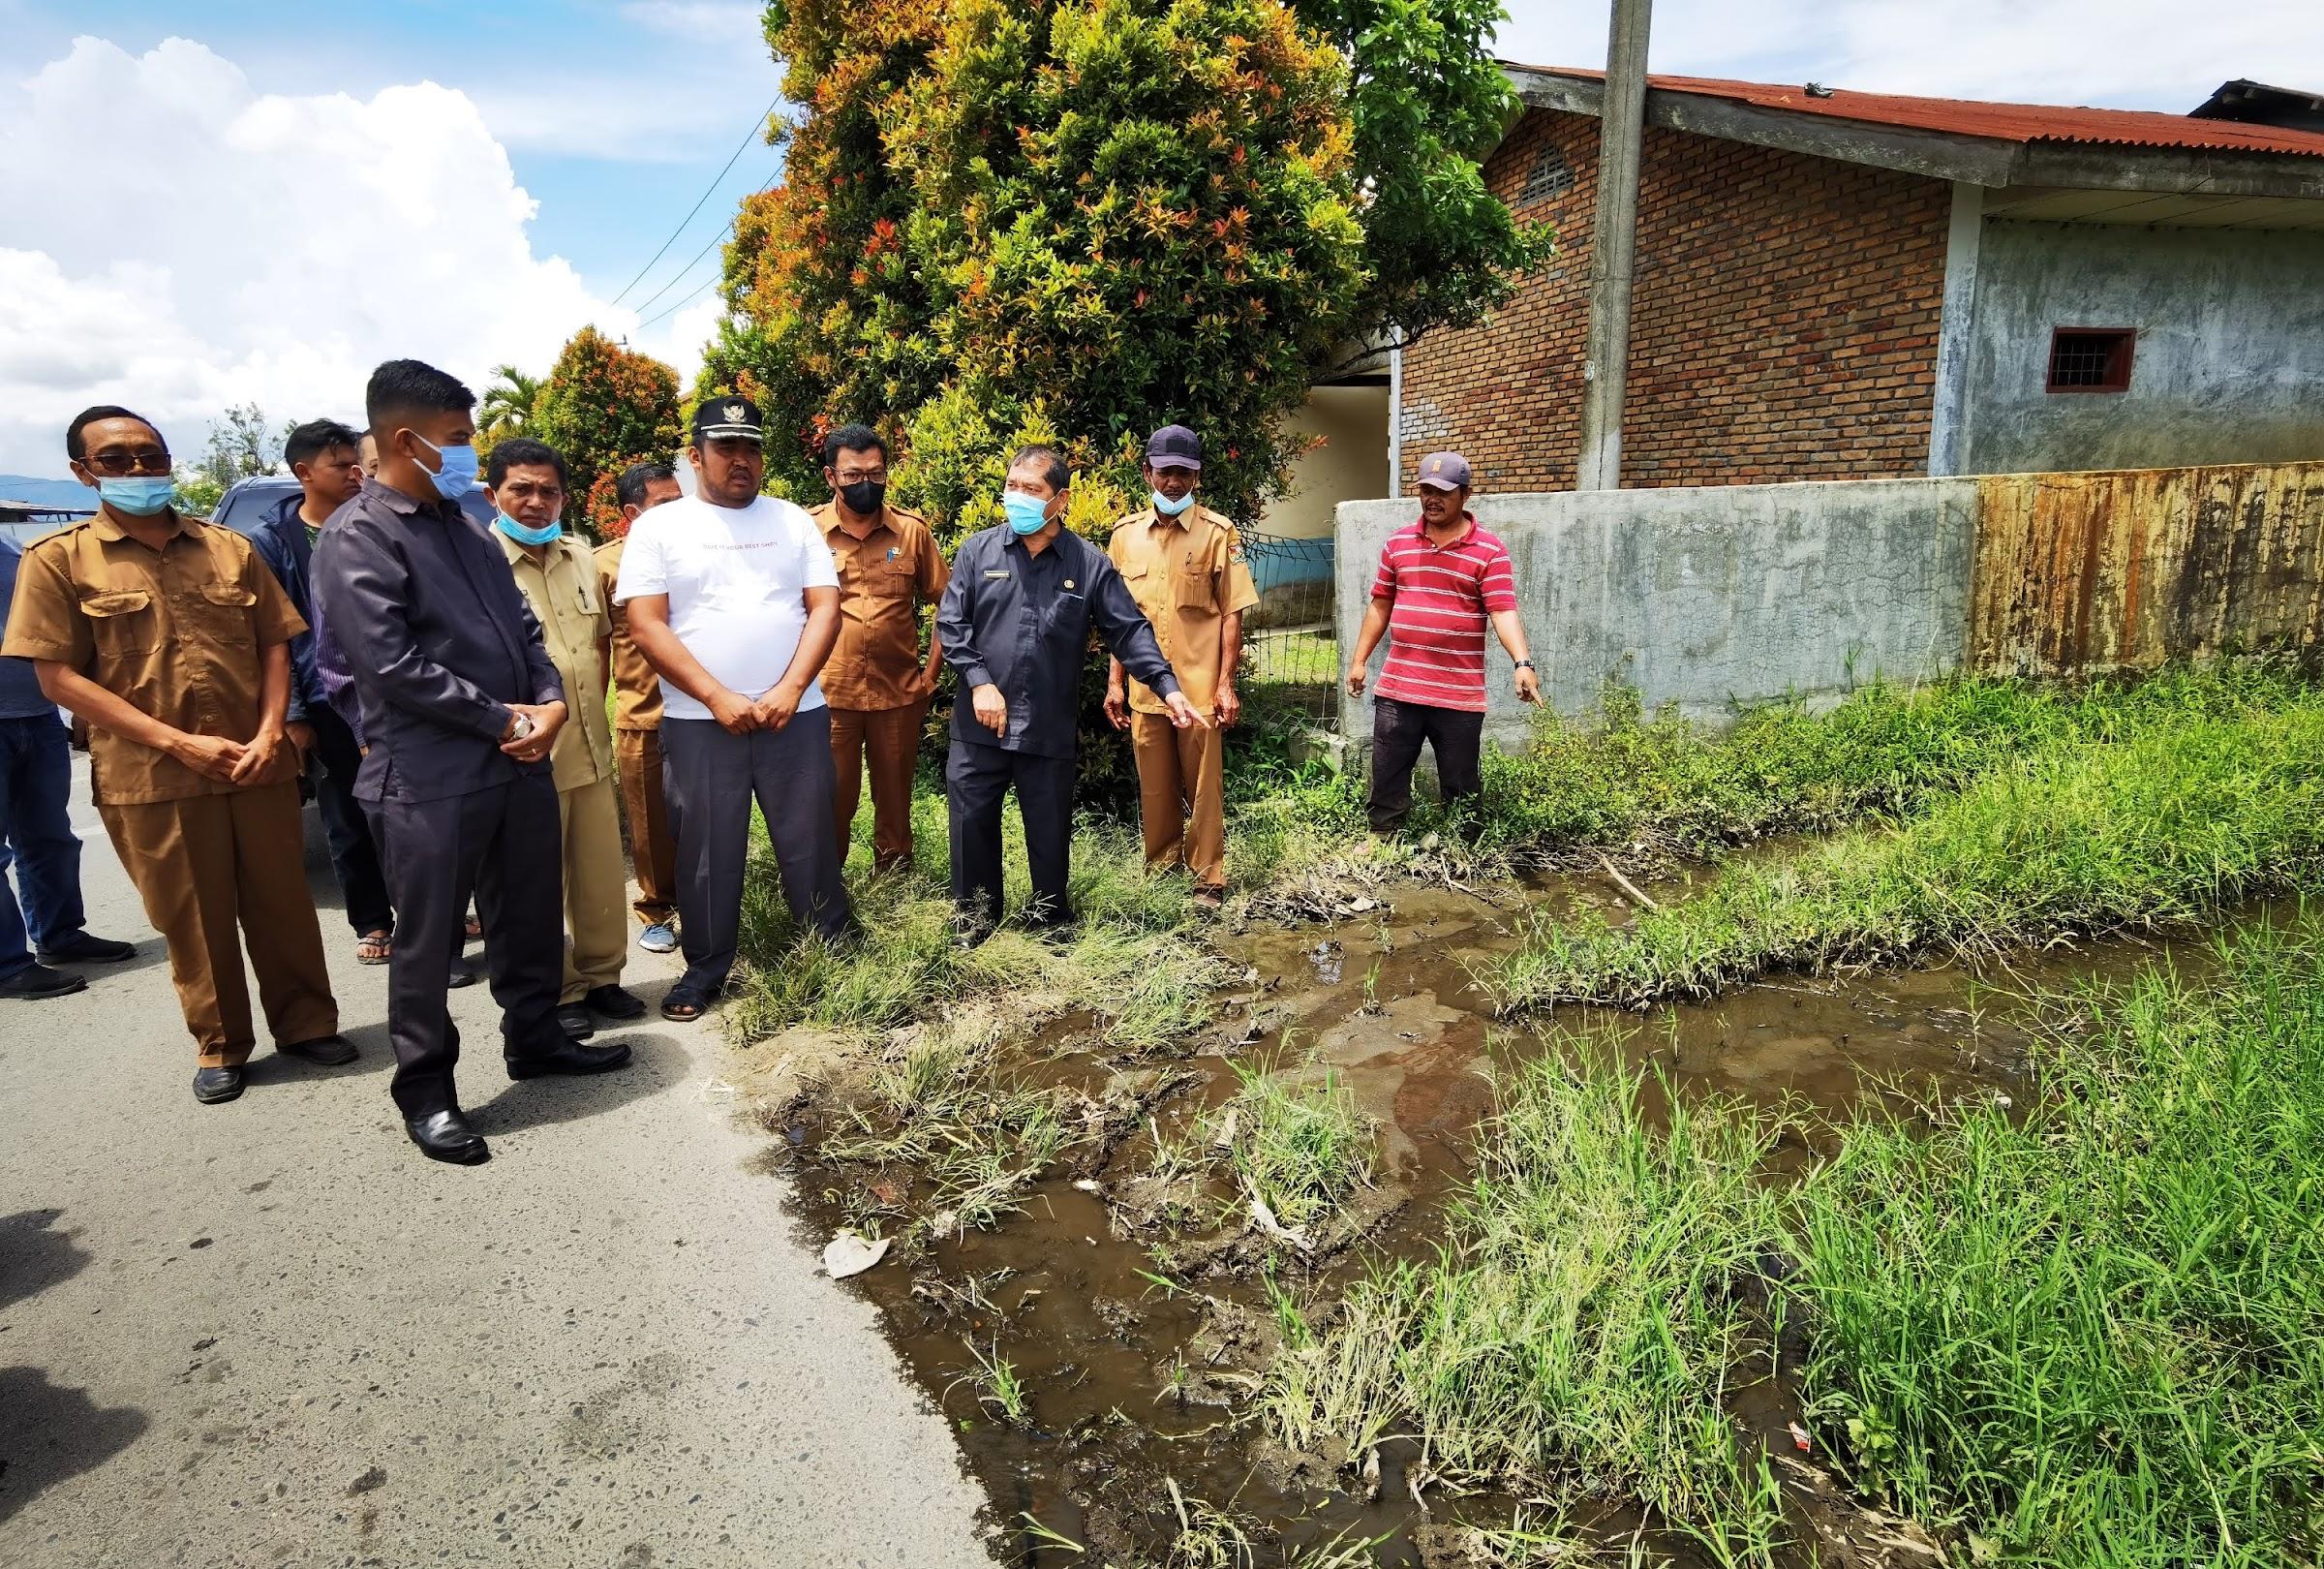 Jelang Akhir Jabatan, Bupati Karo Terkelin Brahmana Respon Laporan Warga Terkait TPA Air Limbah Perusahaan Pandia Farm